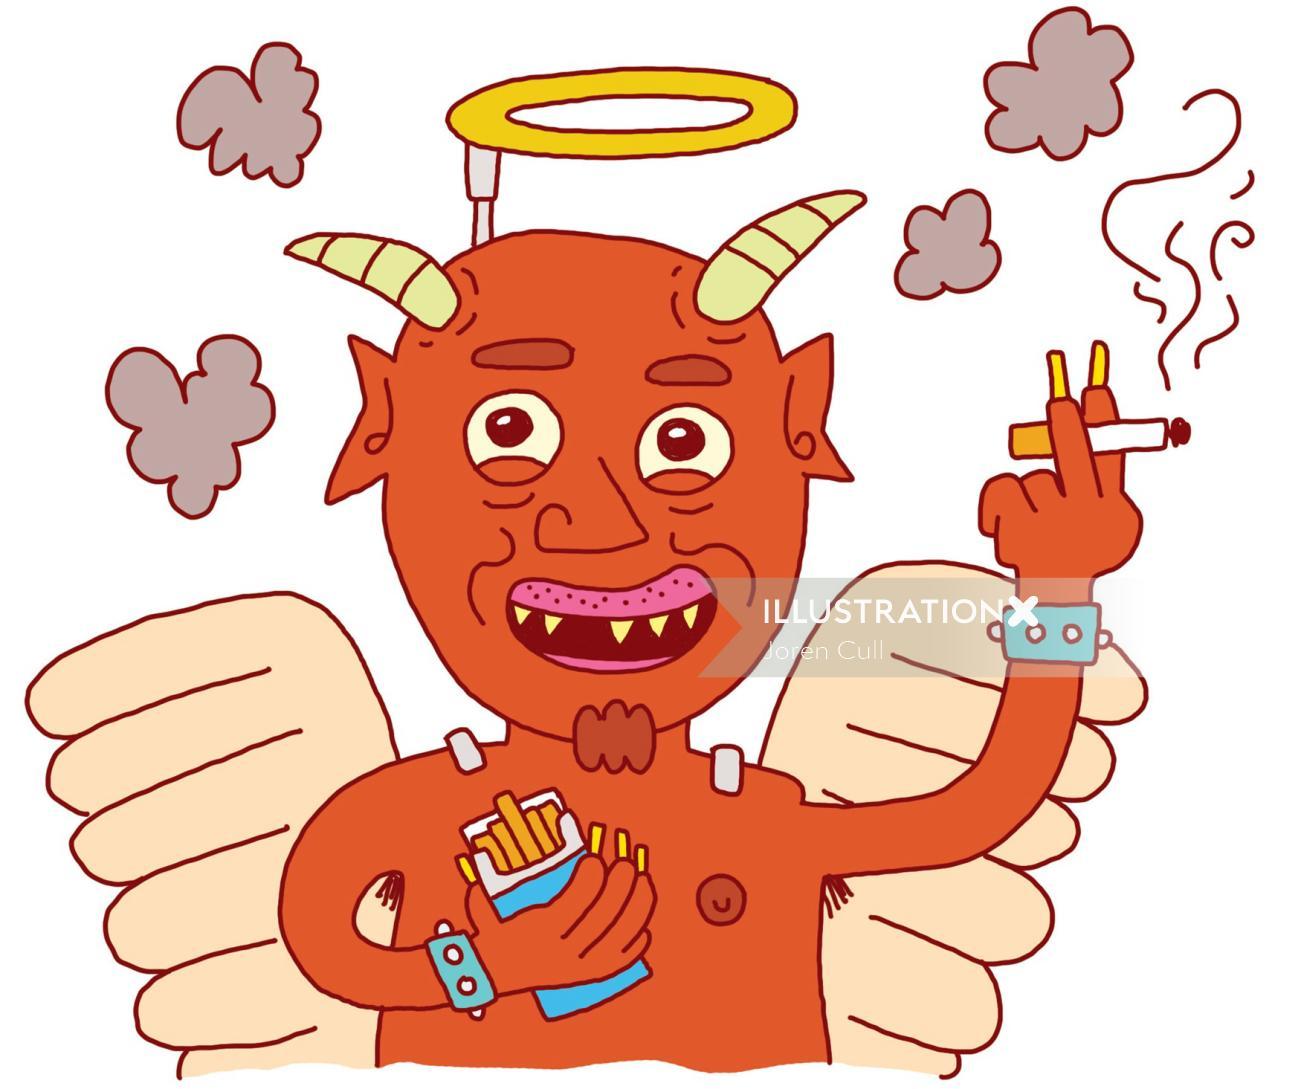 Smoking devil comic illustration